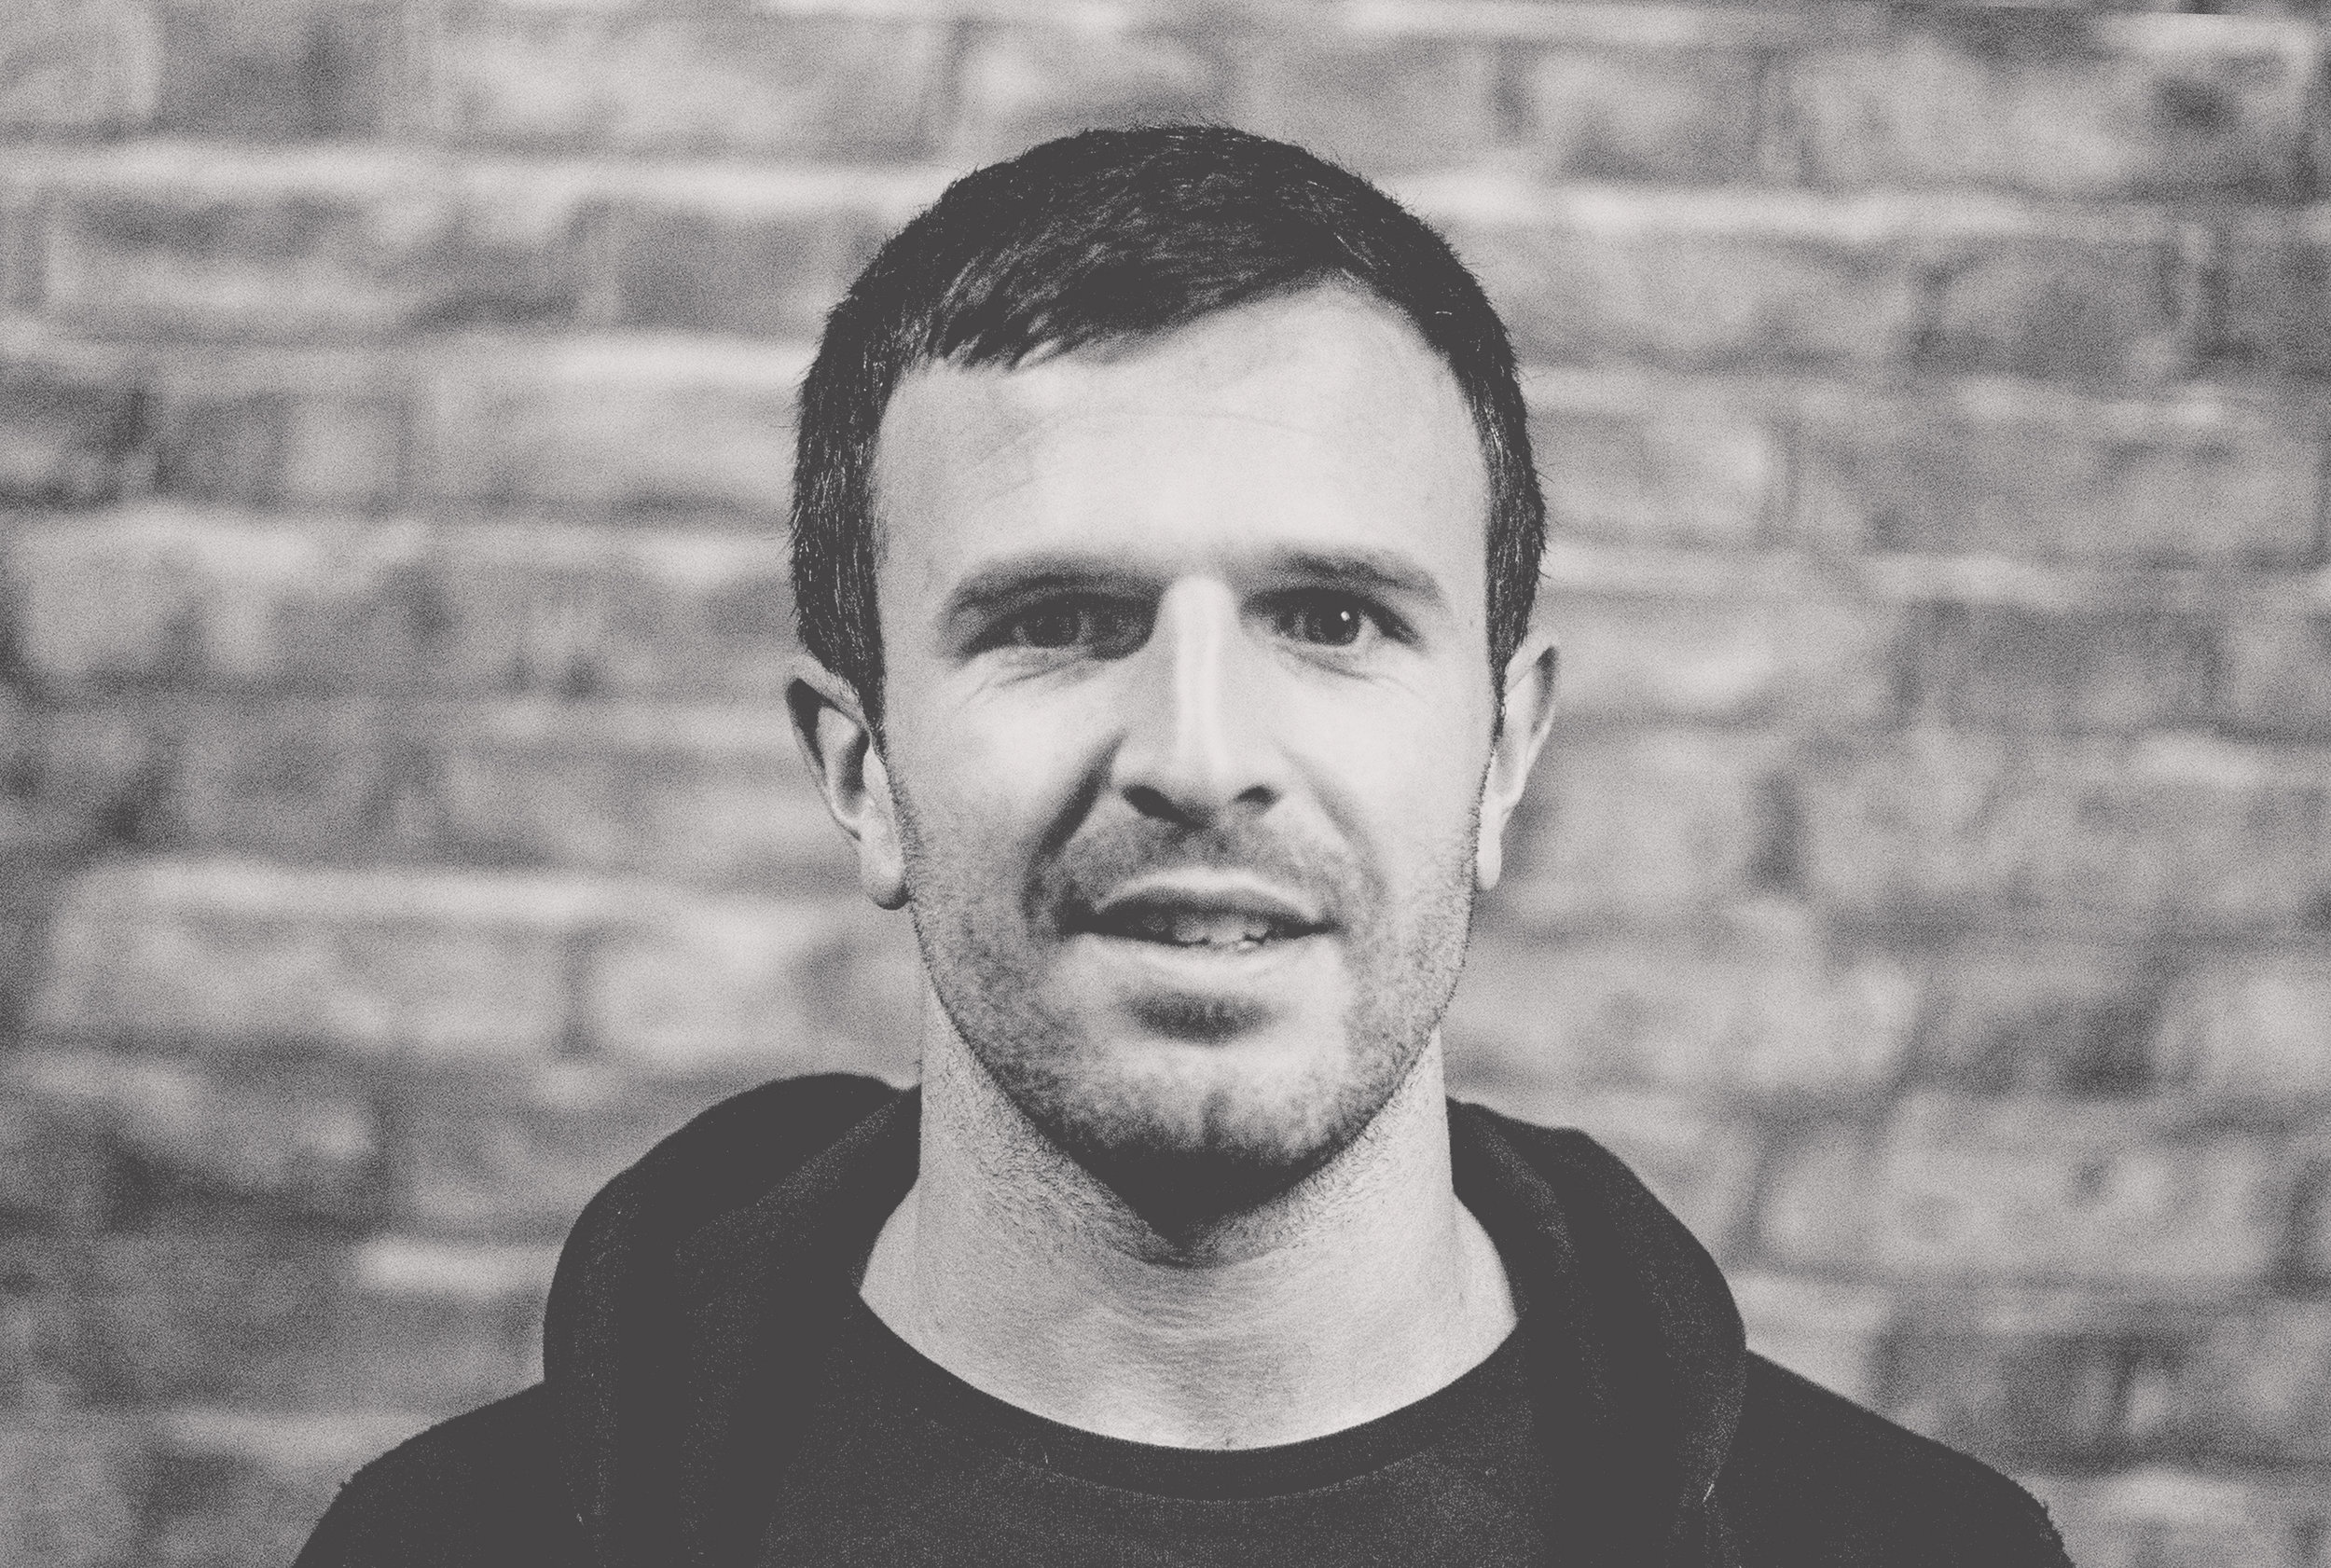 Danny McGuinness danny@surfacestudio.co.uk (+44) 7806 773452